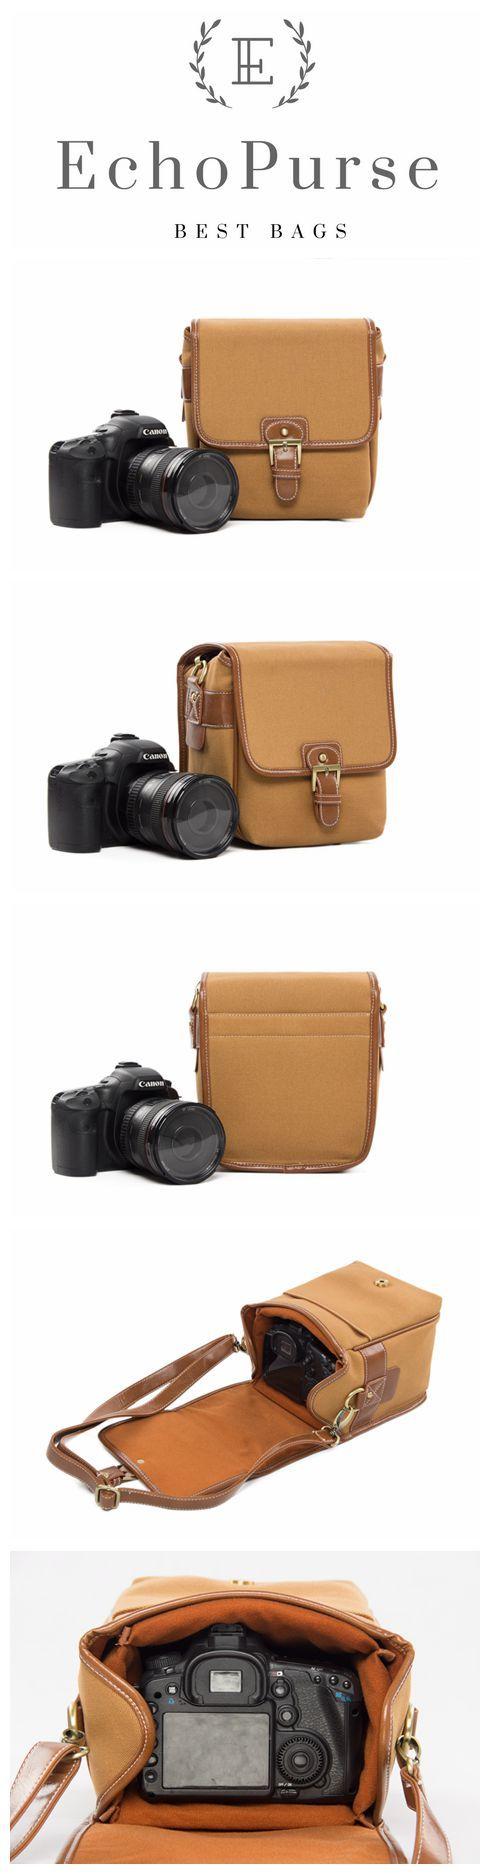 Handmade Leather DSLR Camera Pouch, SLR Camera Purse 1356S